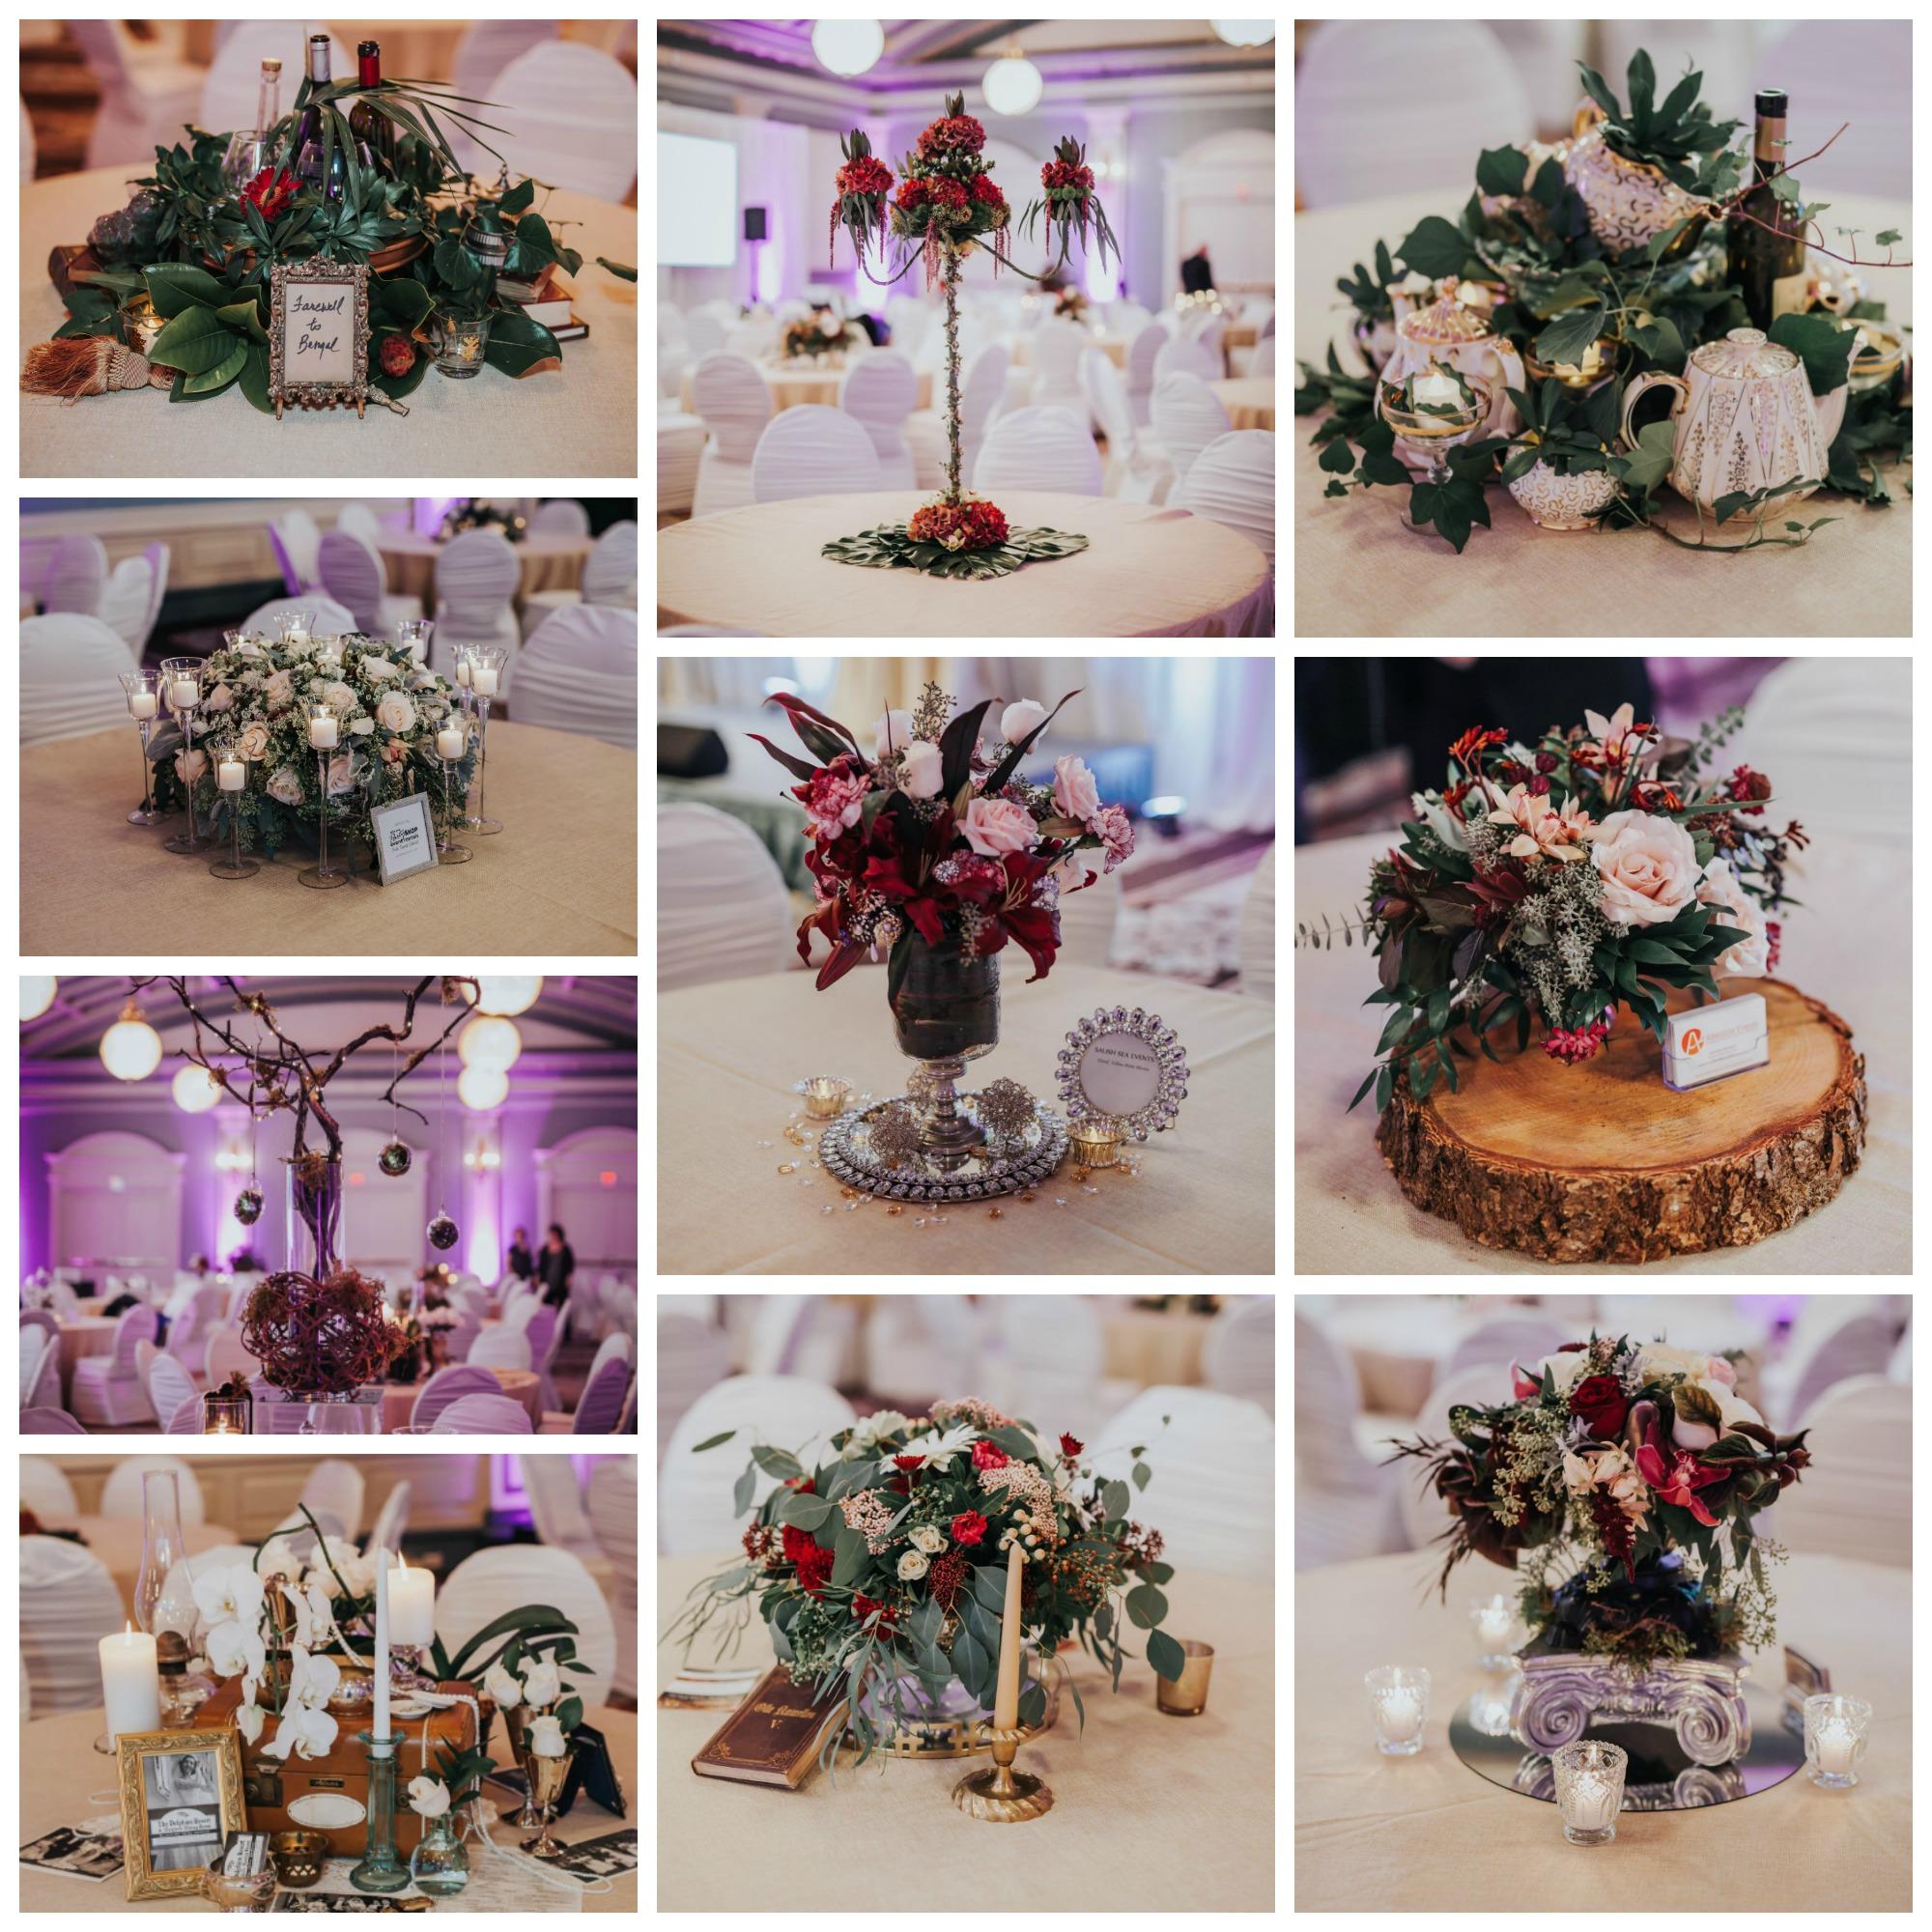 Vancouver Island Wedding Awards 2016 at Fairmont Empress Floral Decor